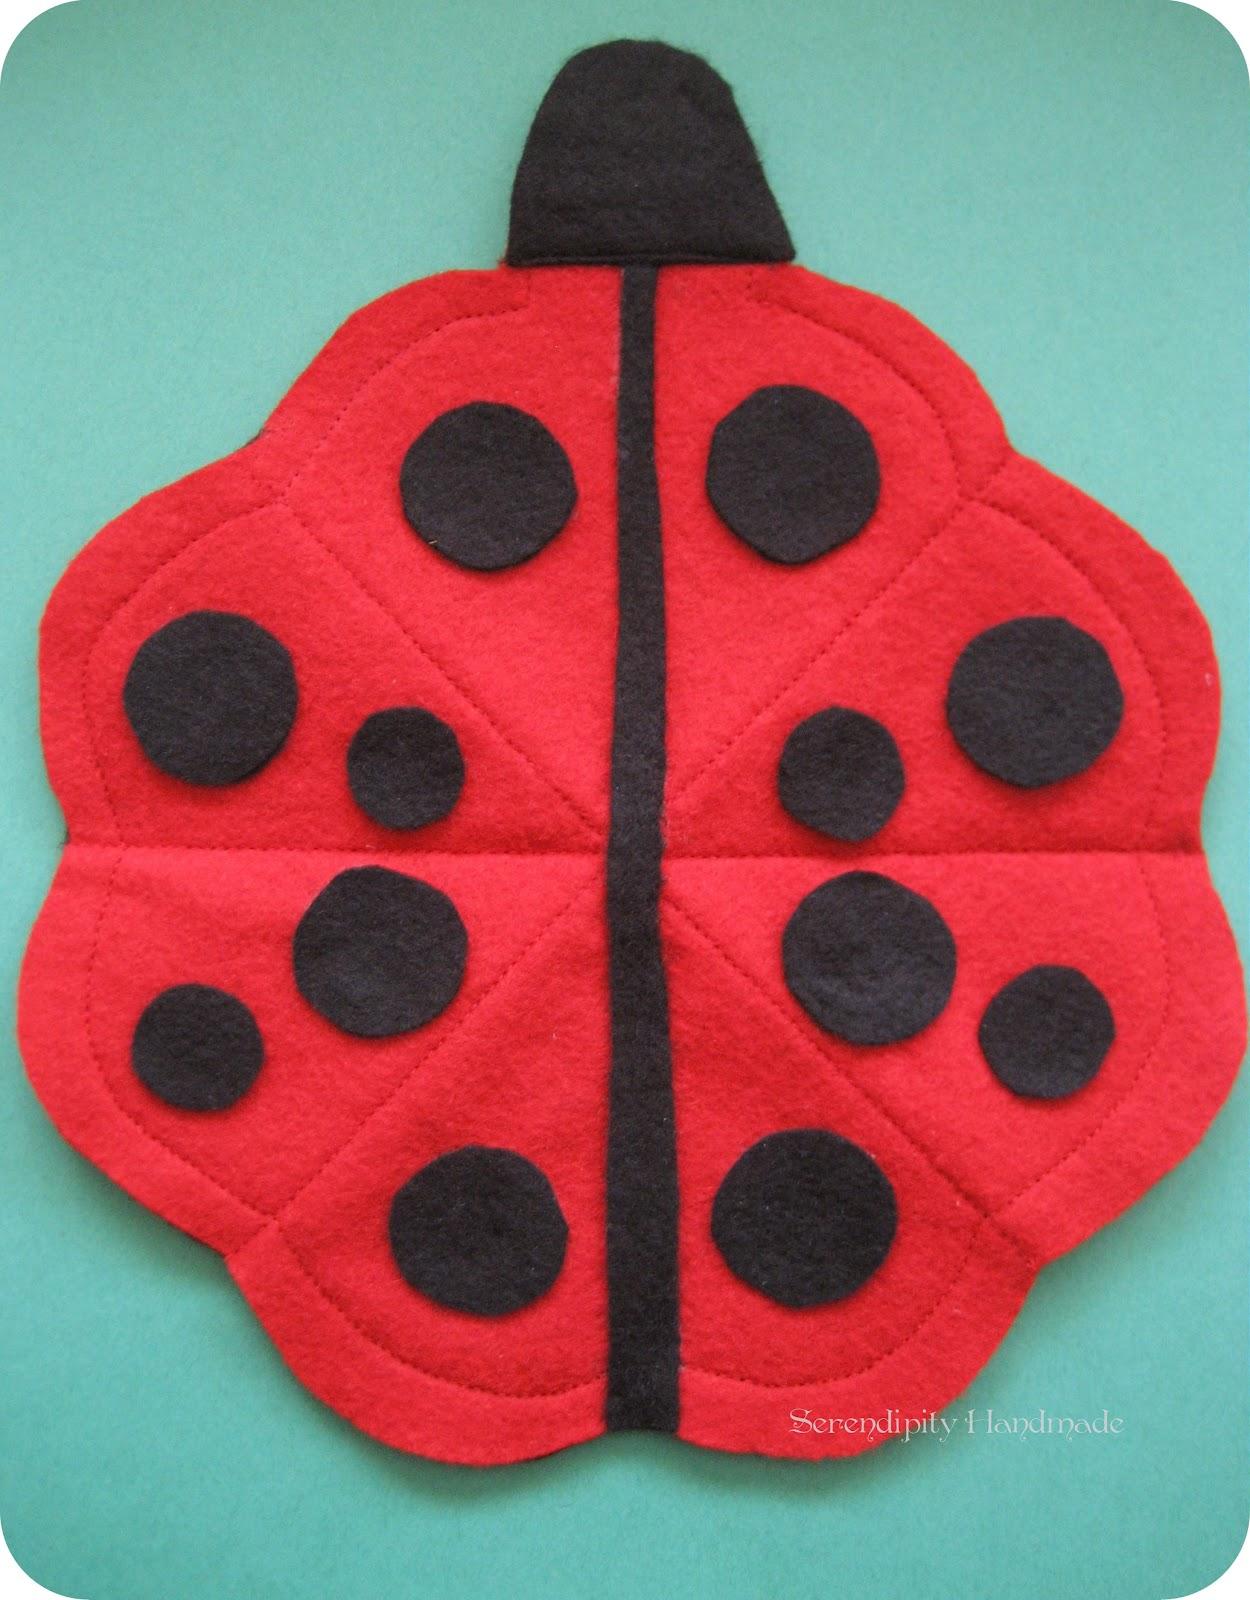 serendipity handmade ladybug needle case tutorial